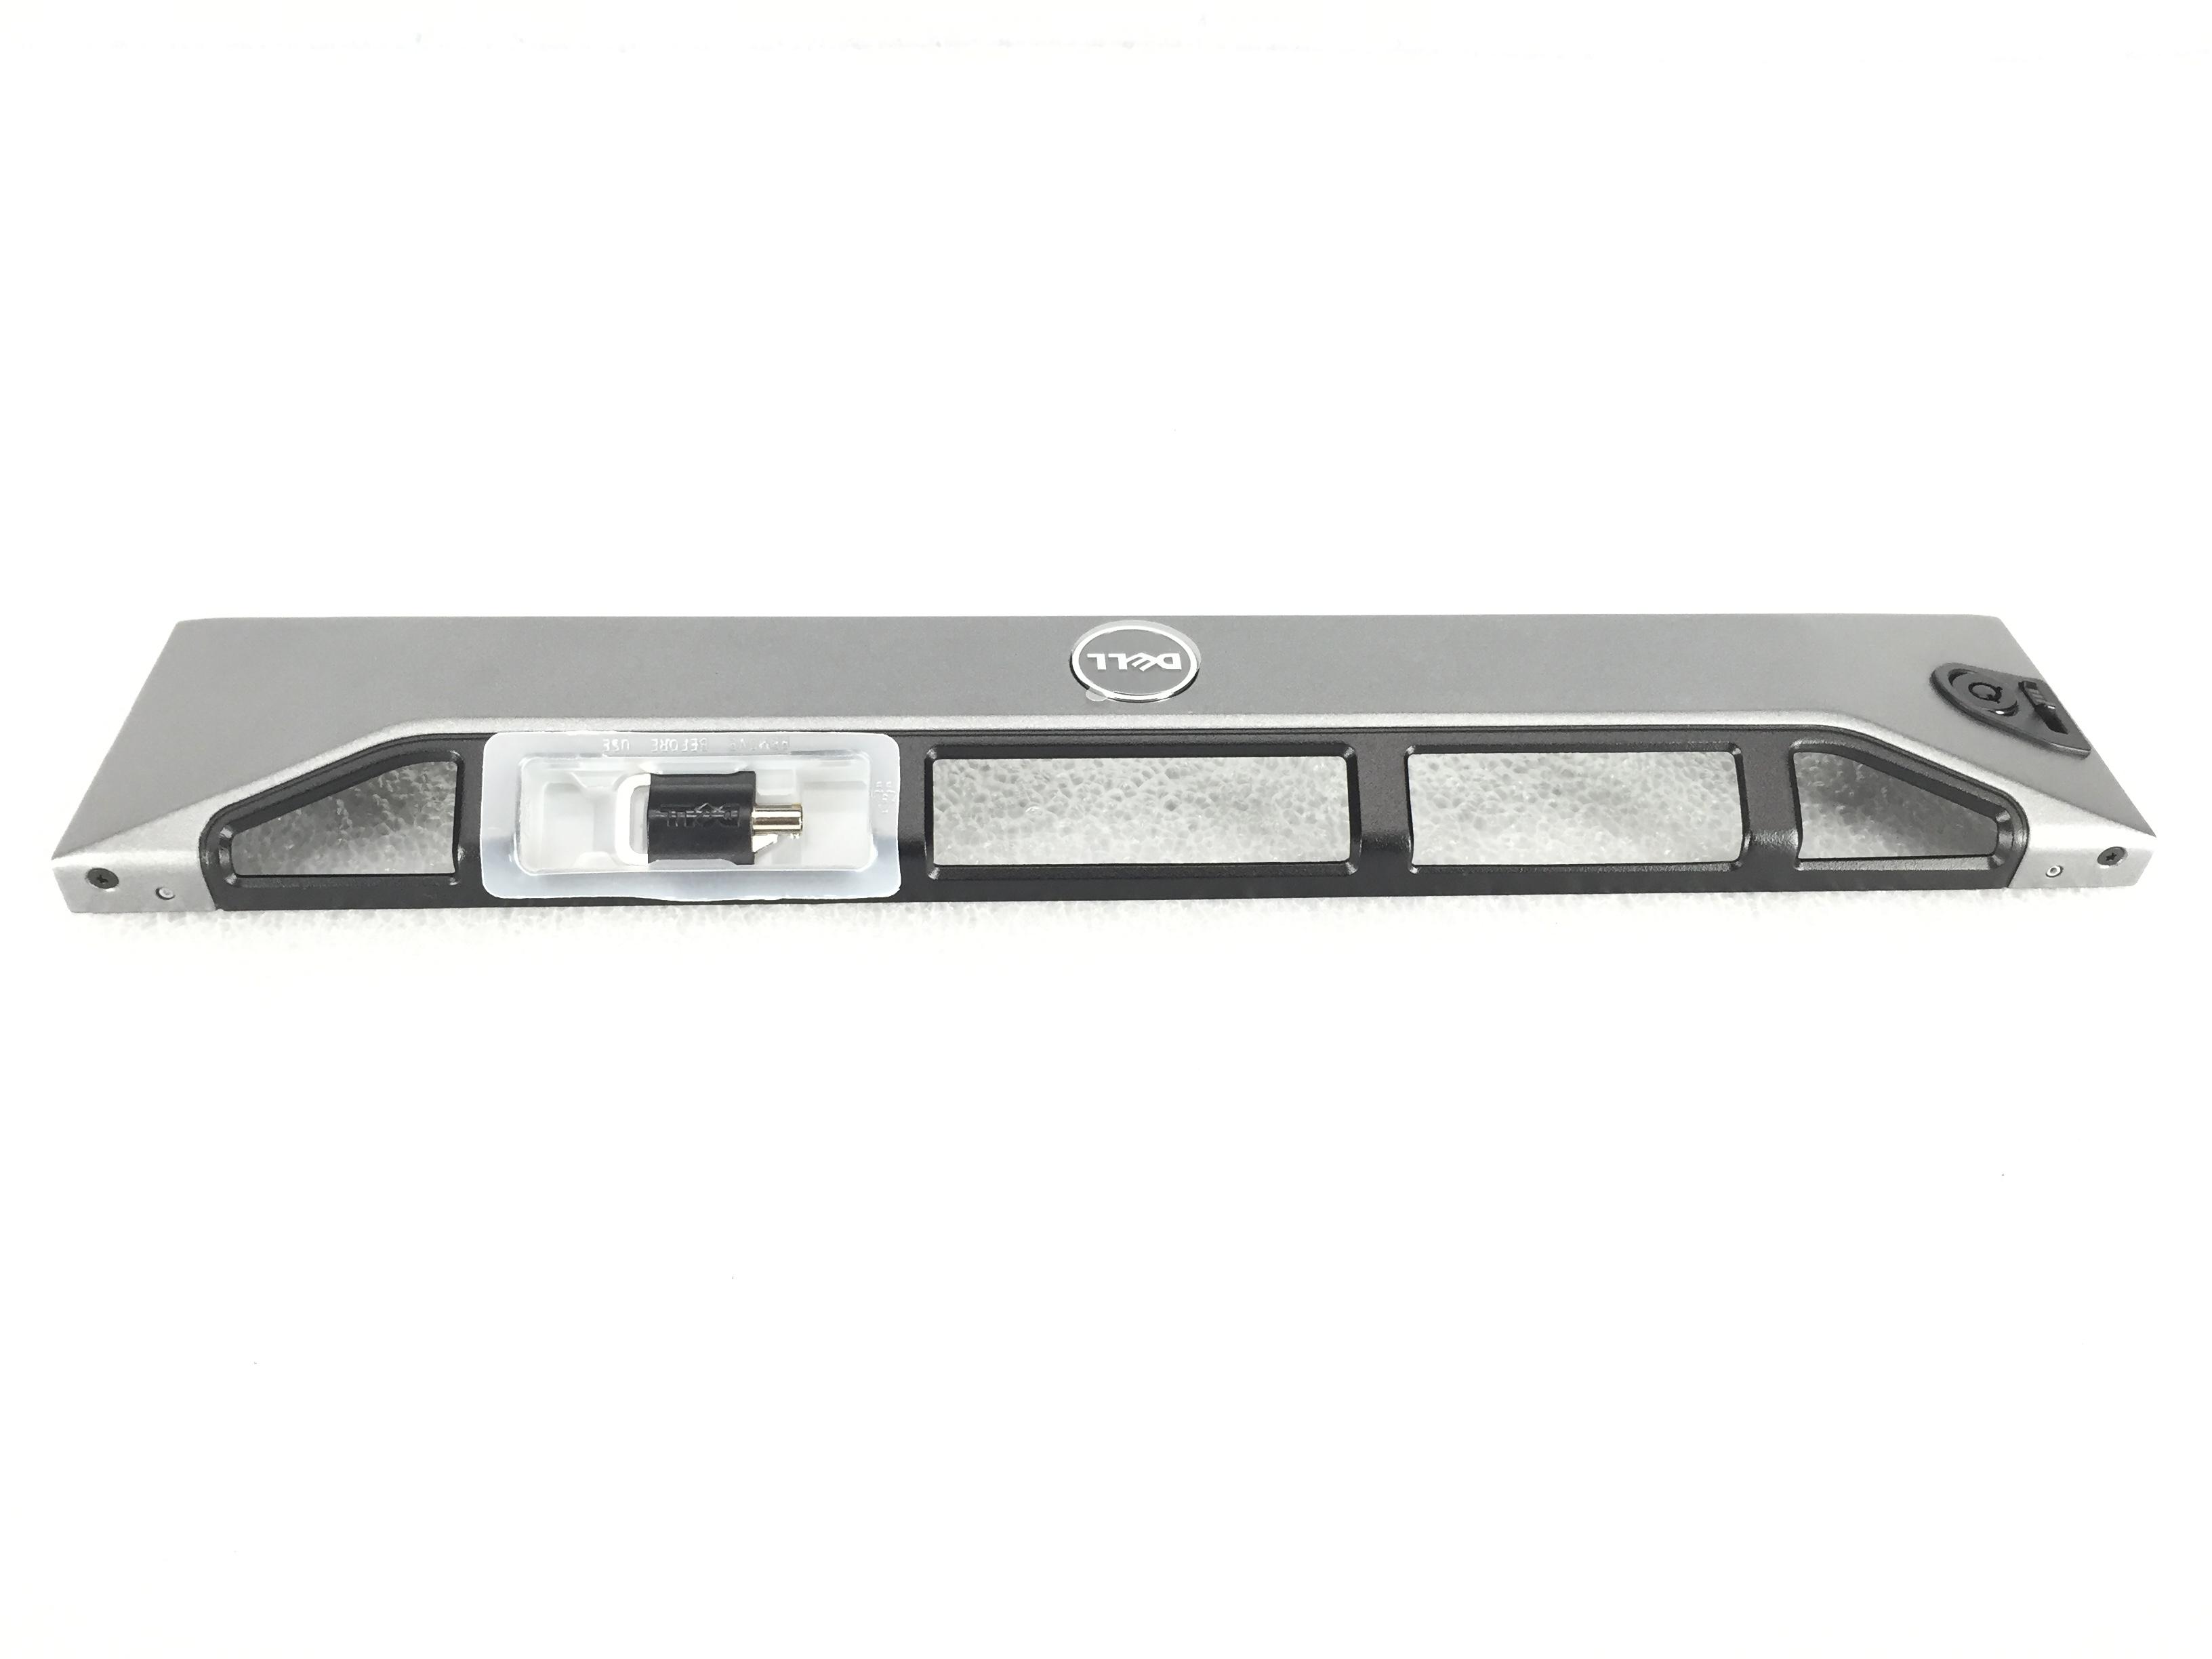 Dell Powervault Md1400 Strada 24 Front Bezel w/ Key (0NWWX6)